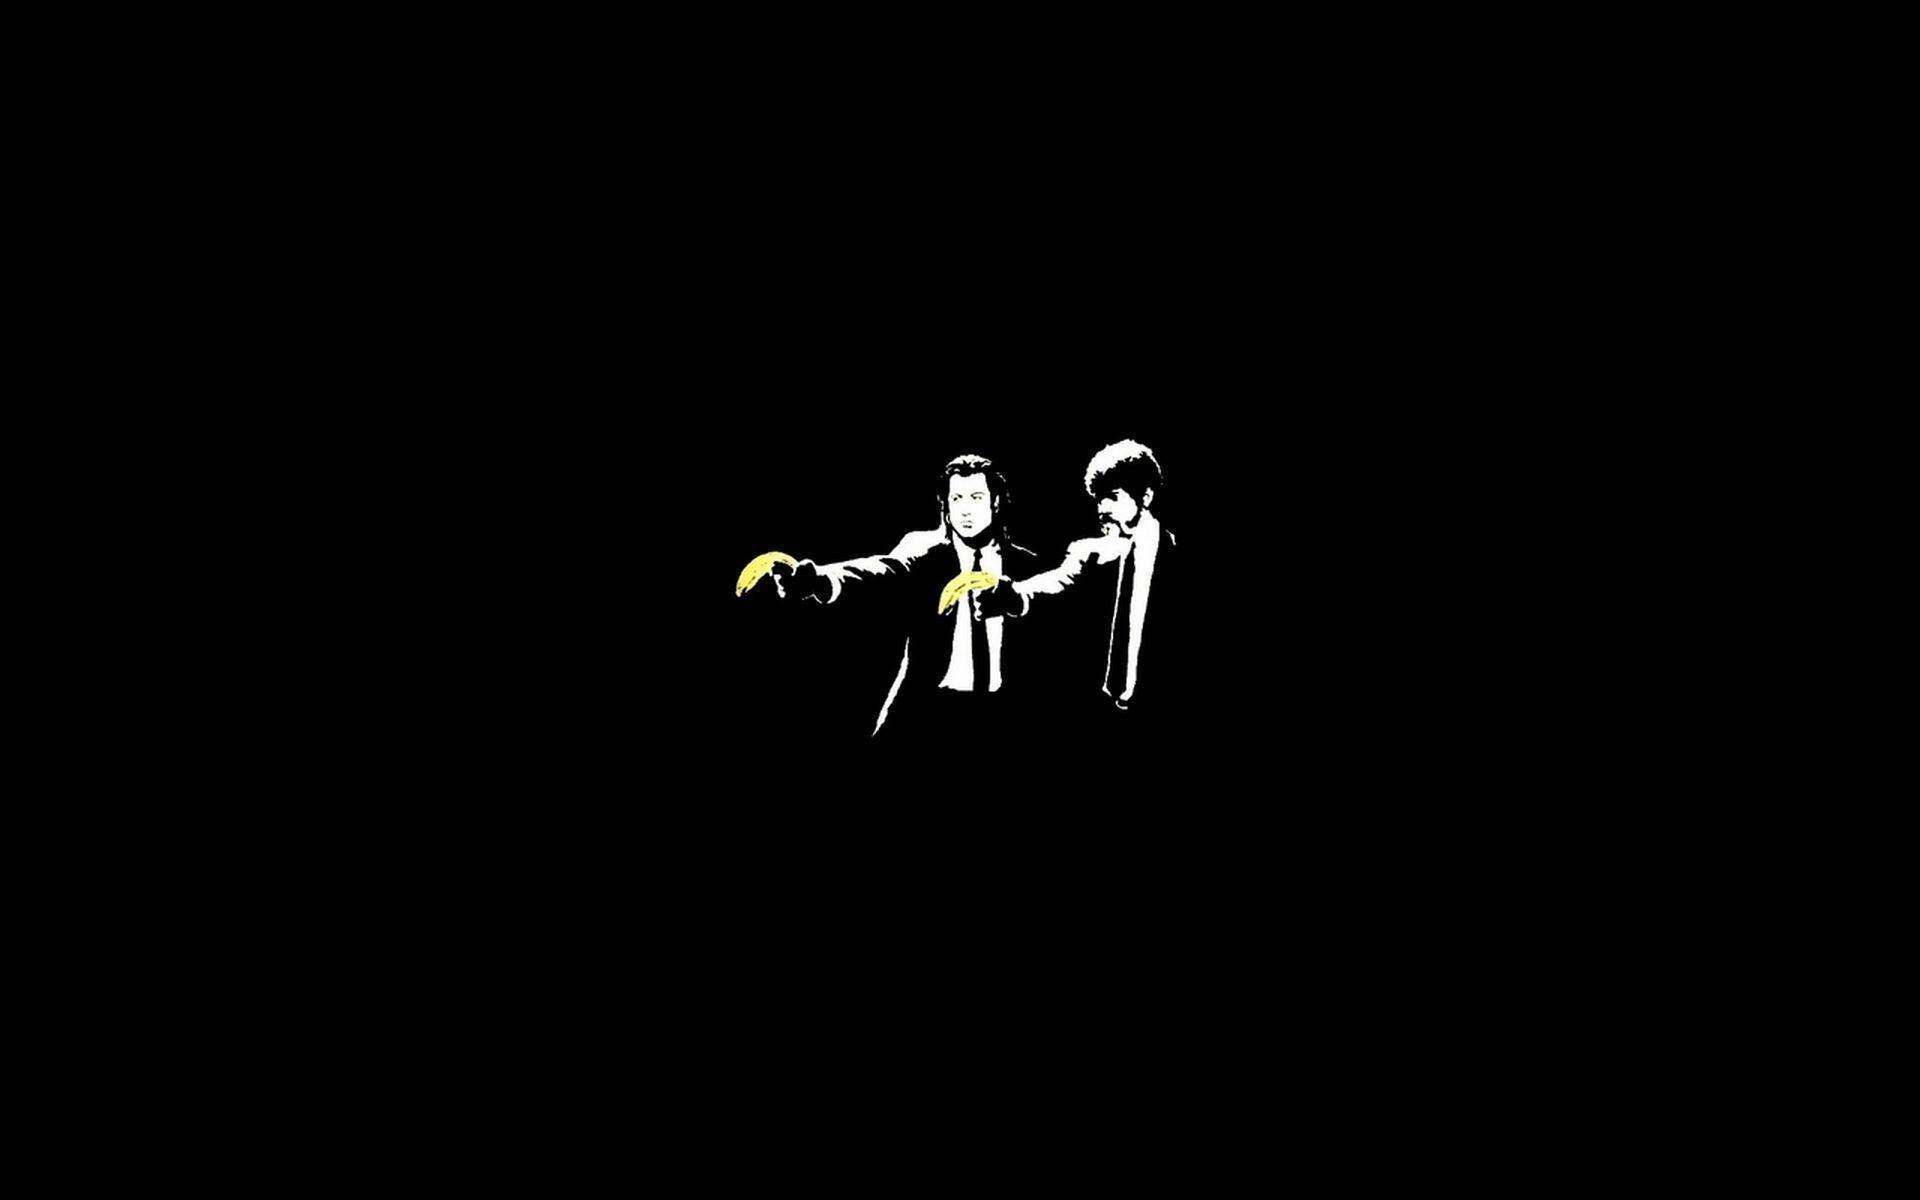 Banksy Hd Wallpaper: Banksy HD Wallpaper (67+ Images